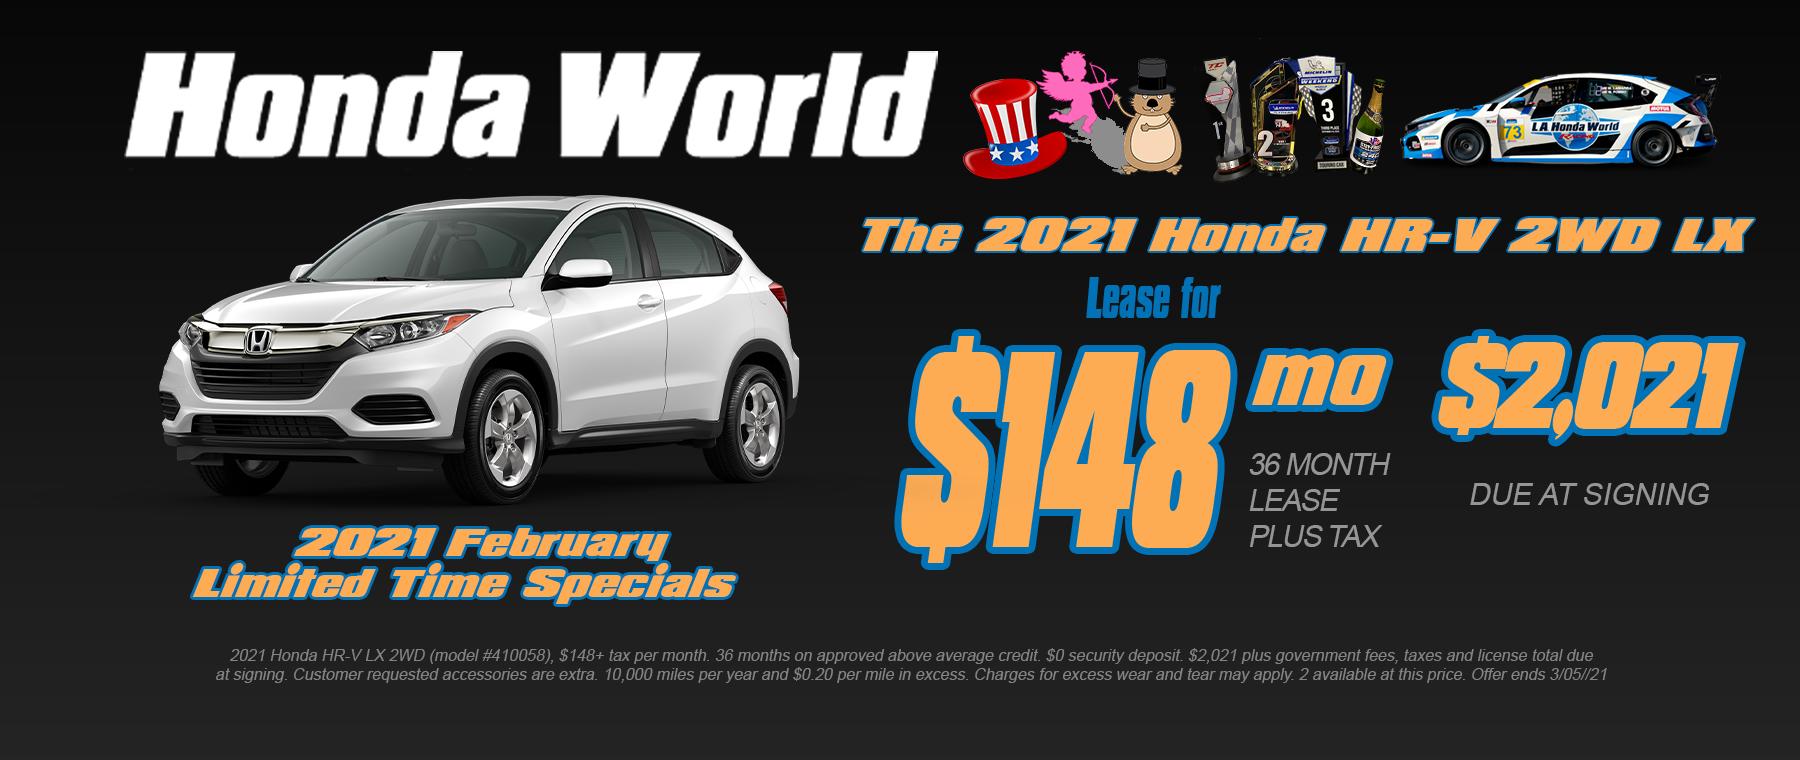 Honda HR-V Lease Offer Los Angeles